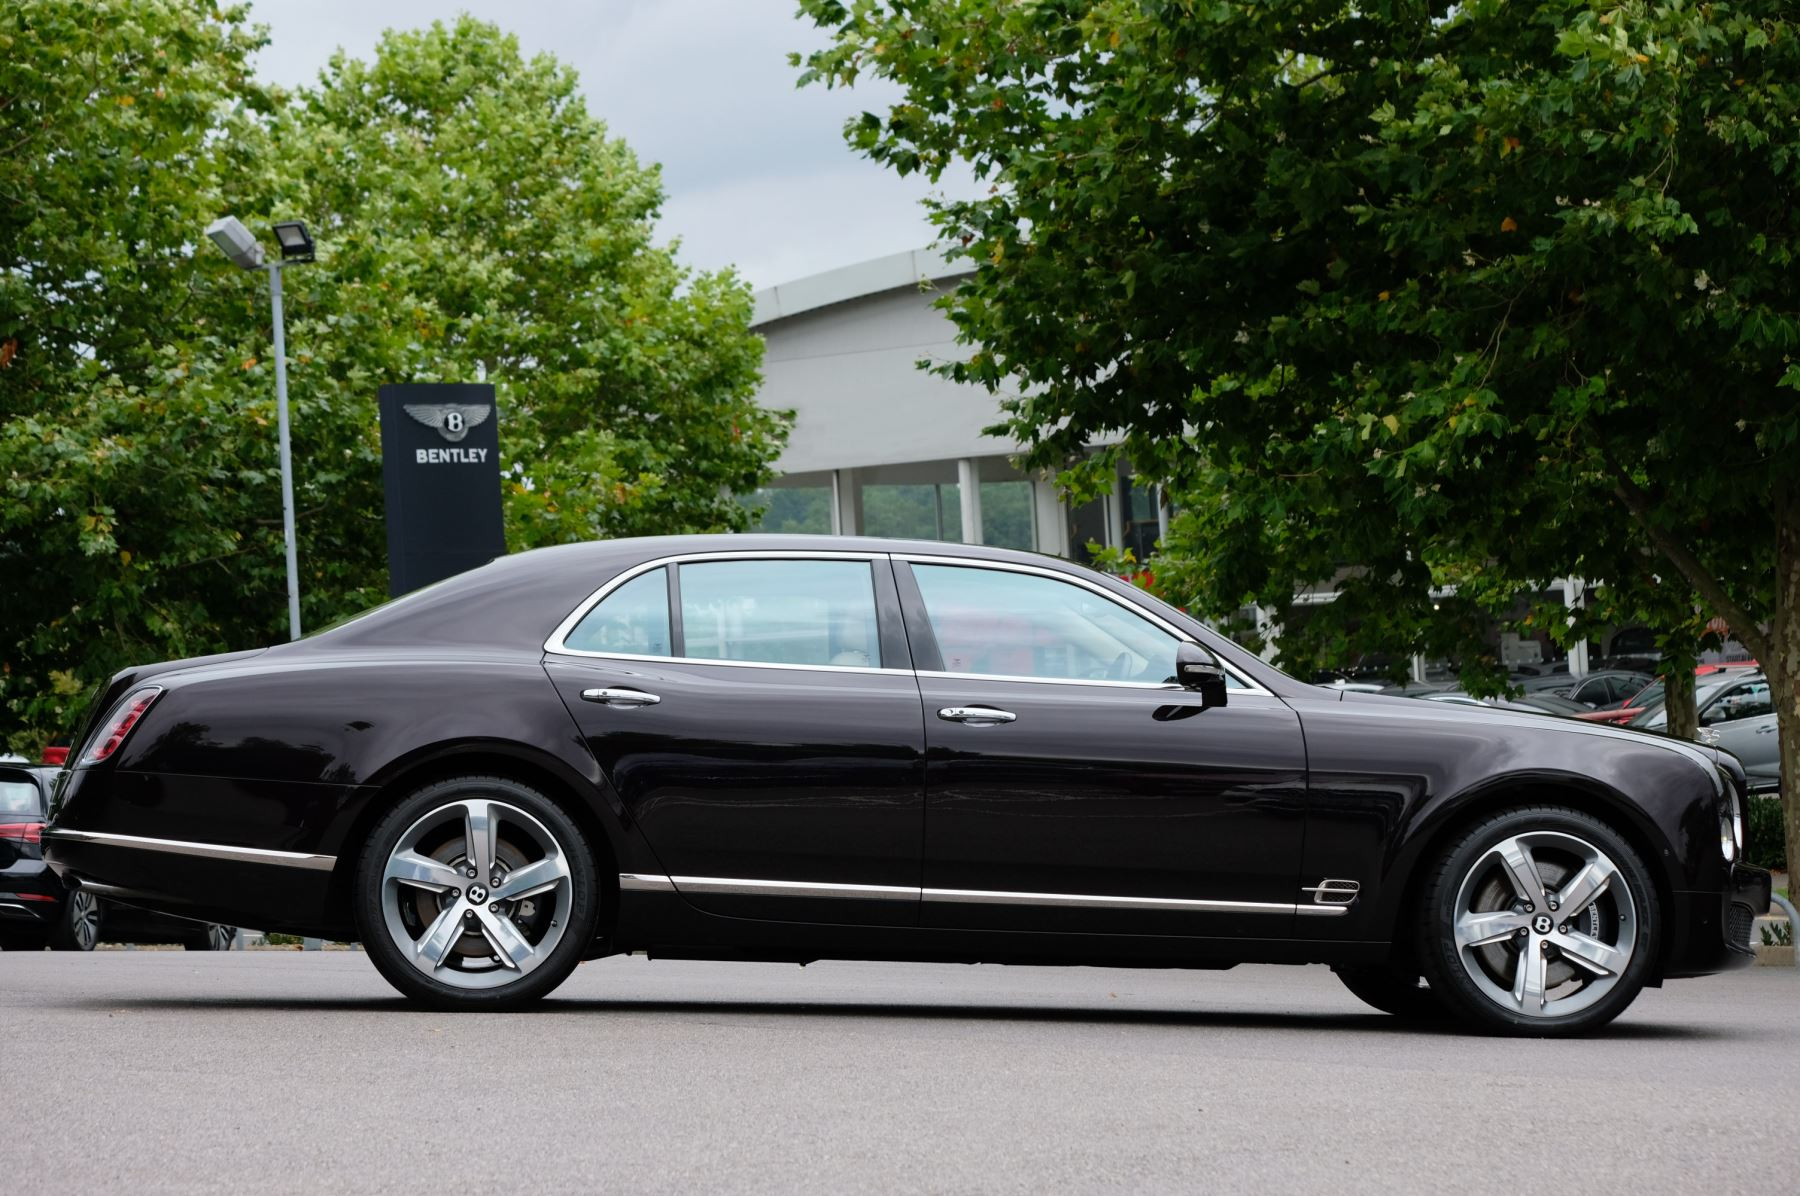 Bentley Mulsanne 6.8 V8 Speed - Speed Premier Specification image 3